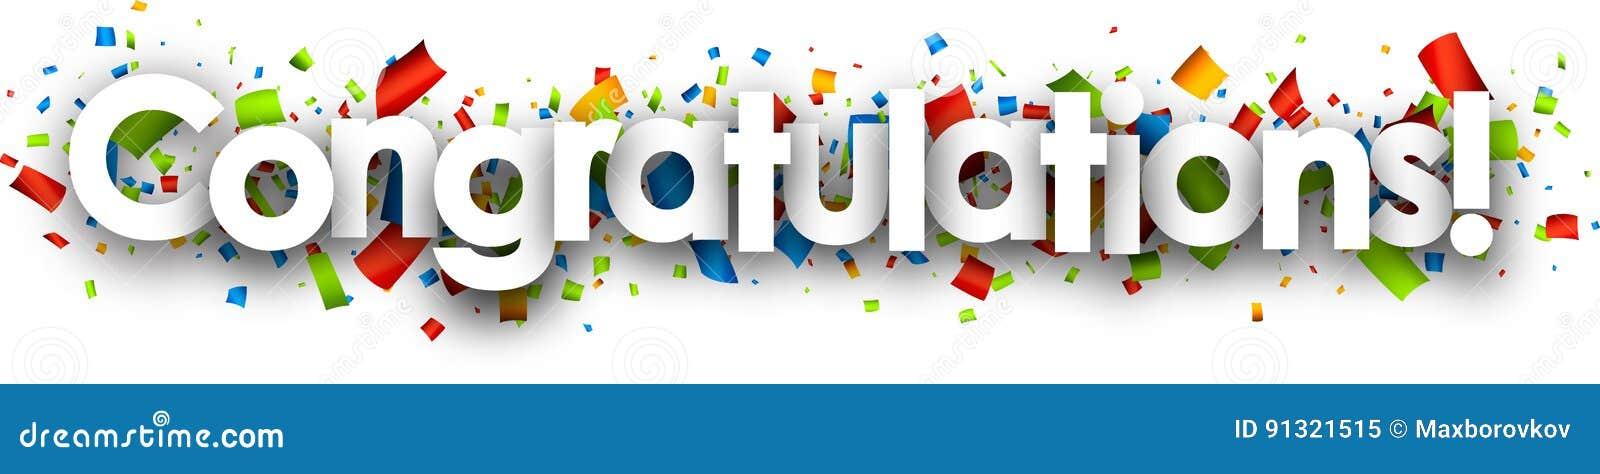 congratulations paper banner stock vector illustration of